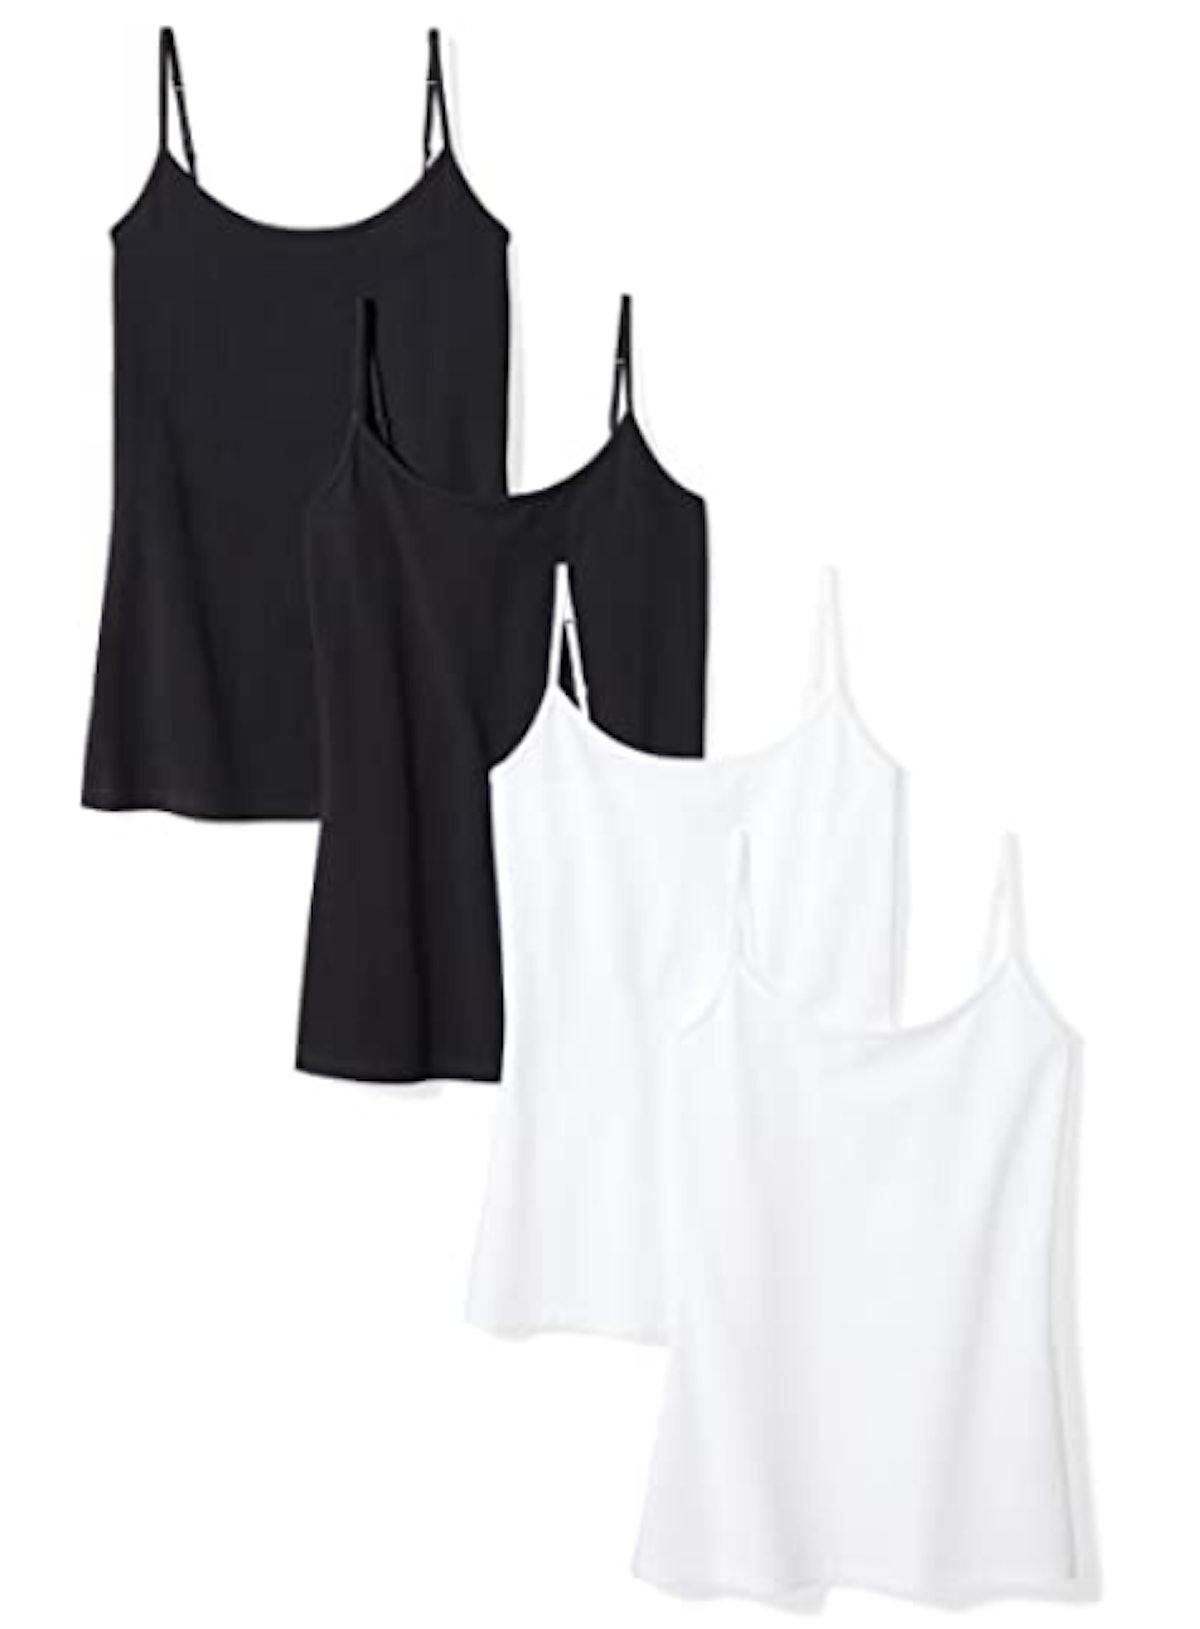 Amazon Essentials Women's 4-Pack Slim-Fit Camisole